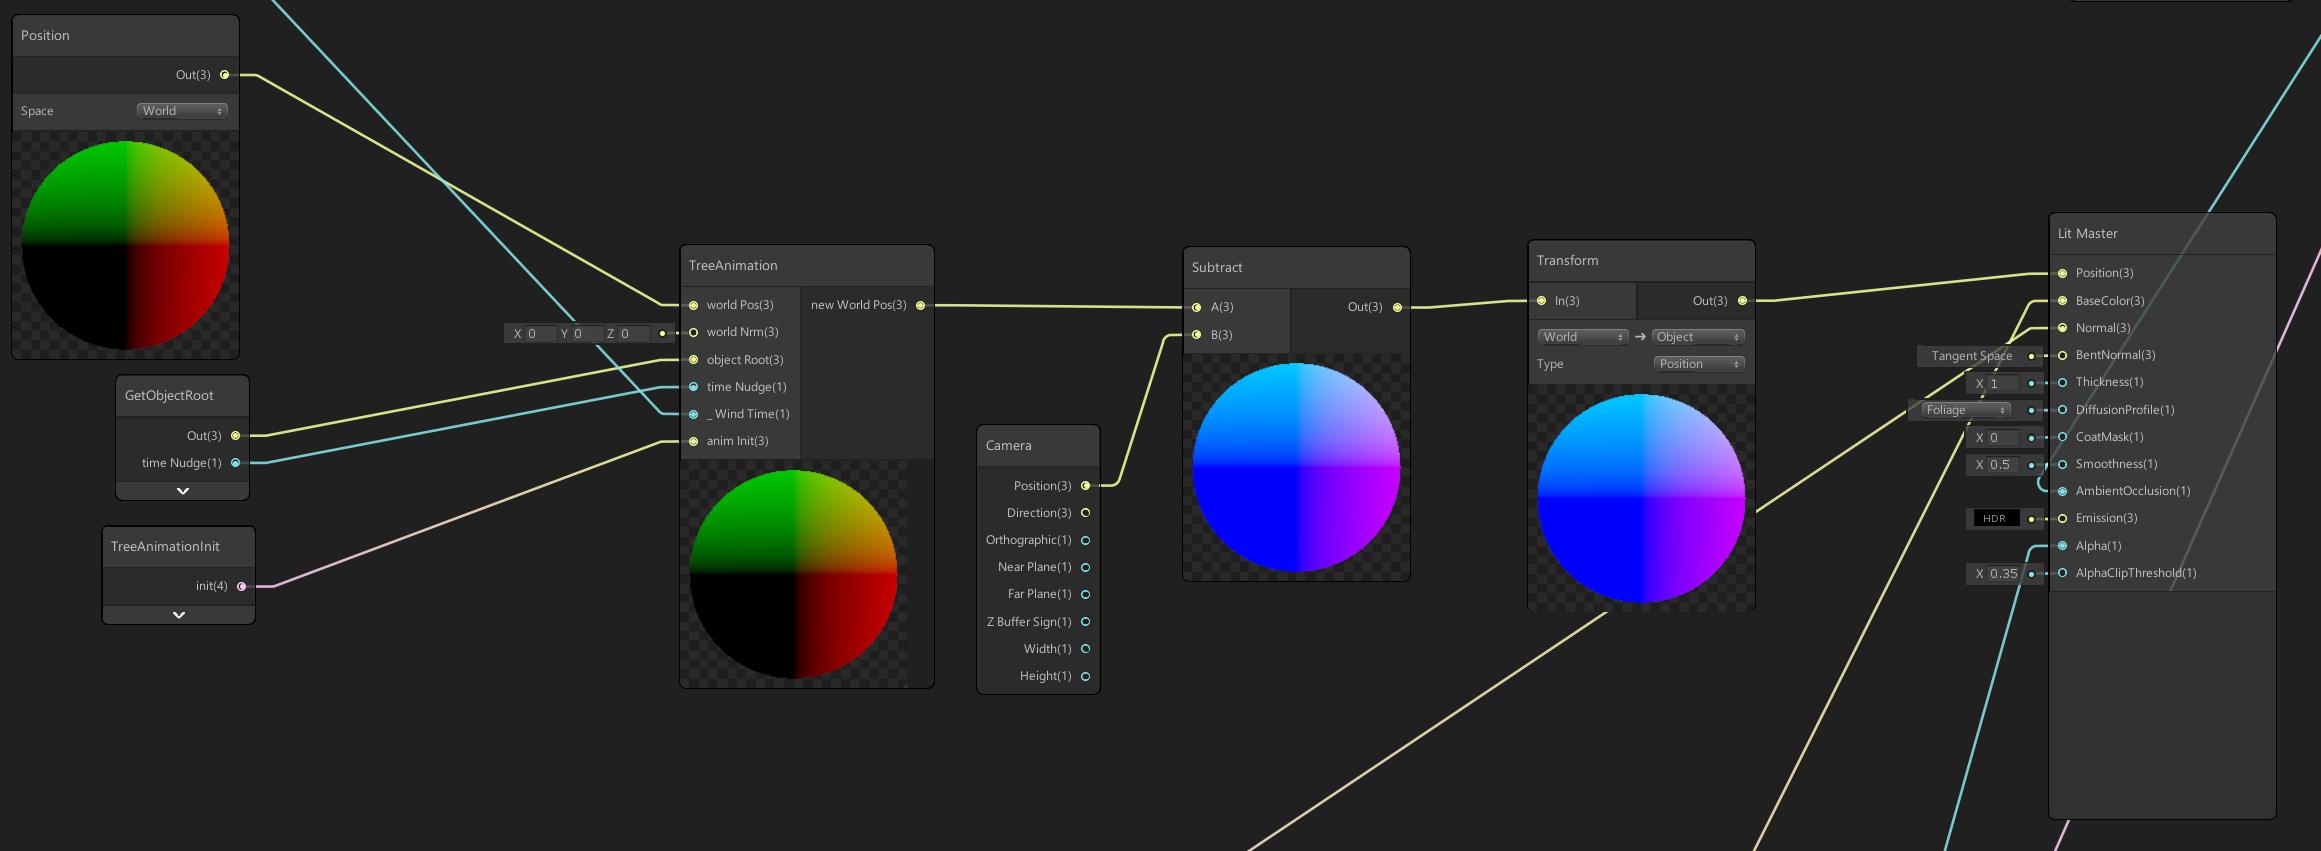 VertexAnimationShaderGraph.png